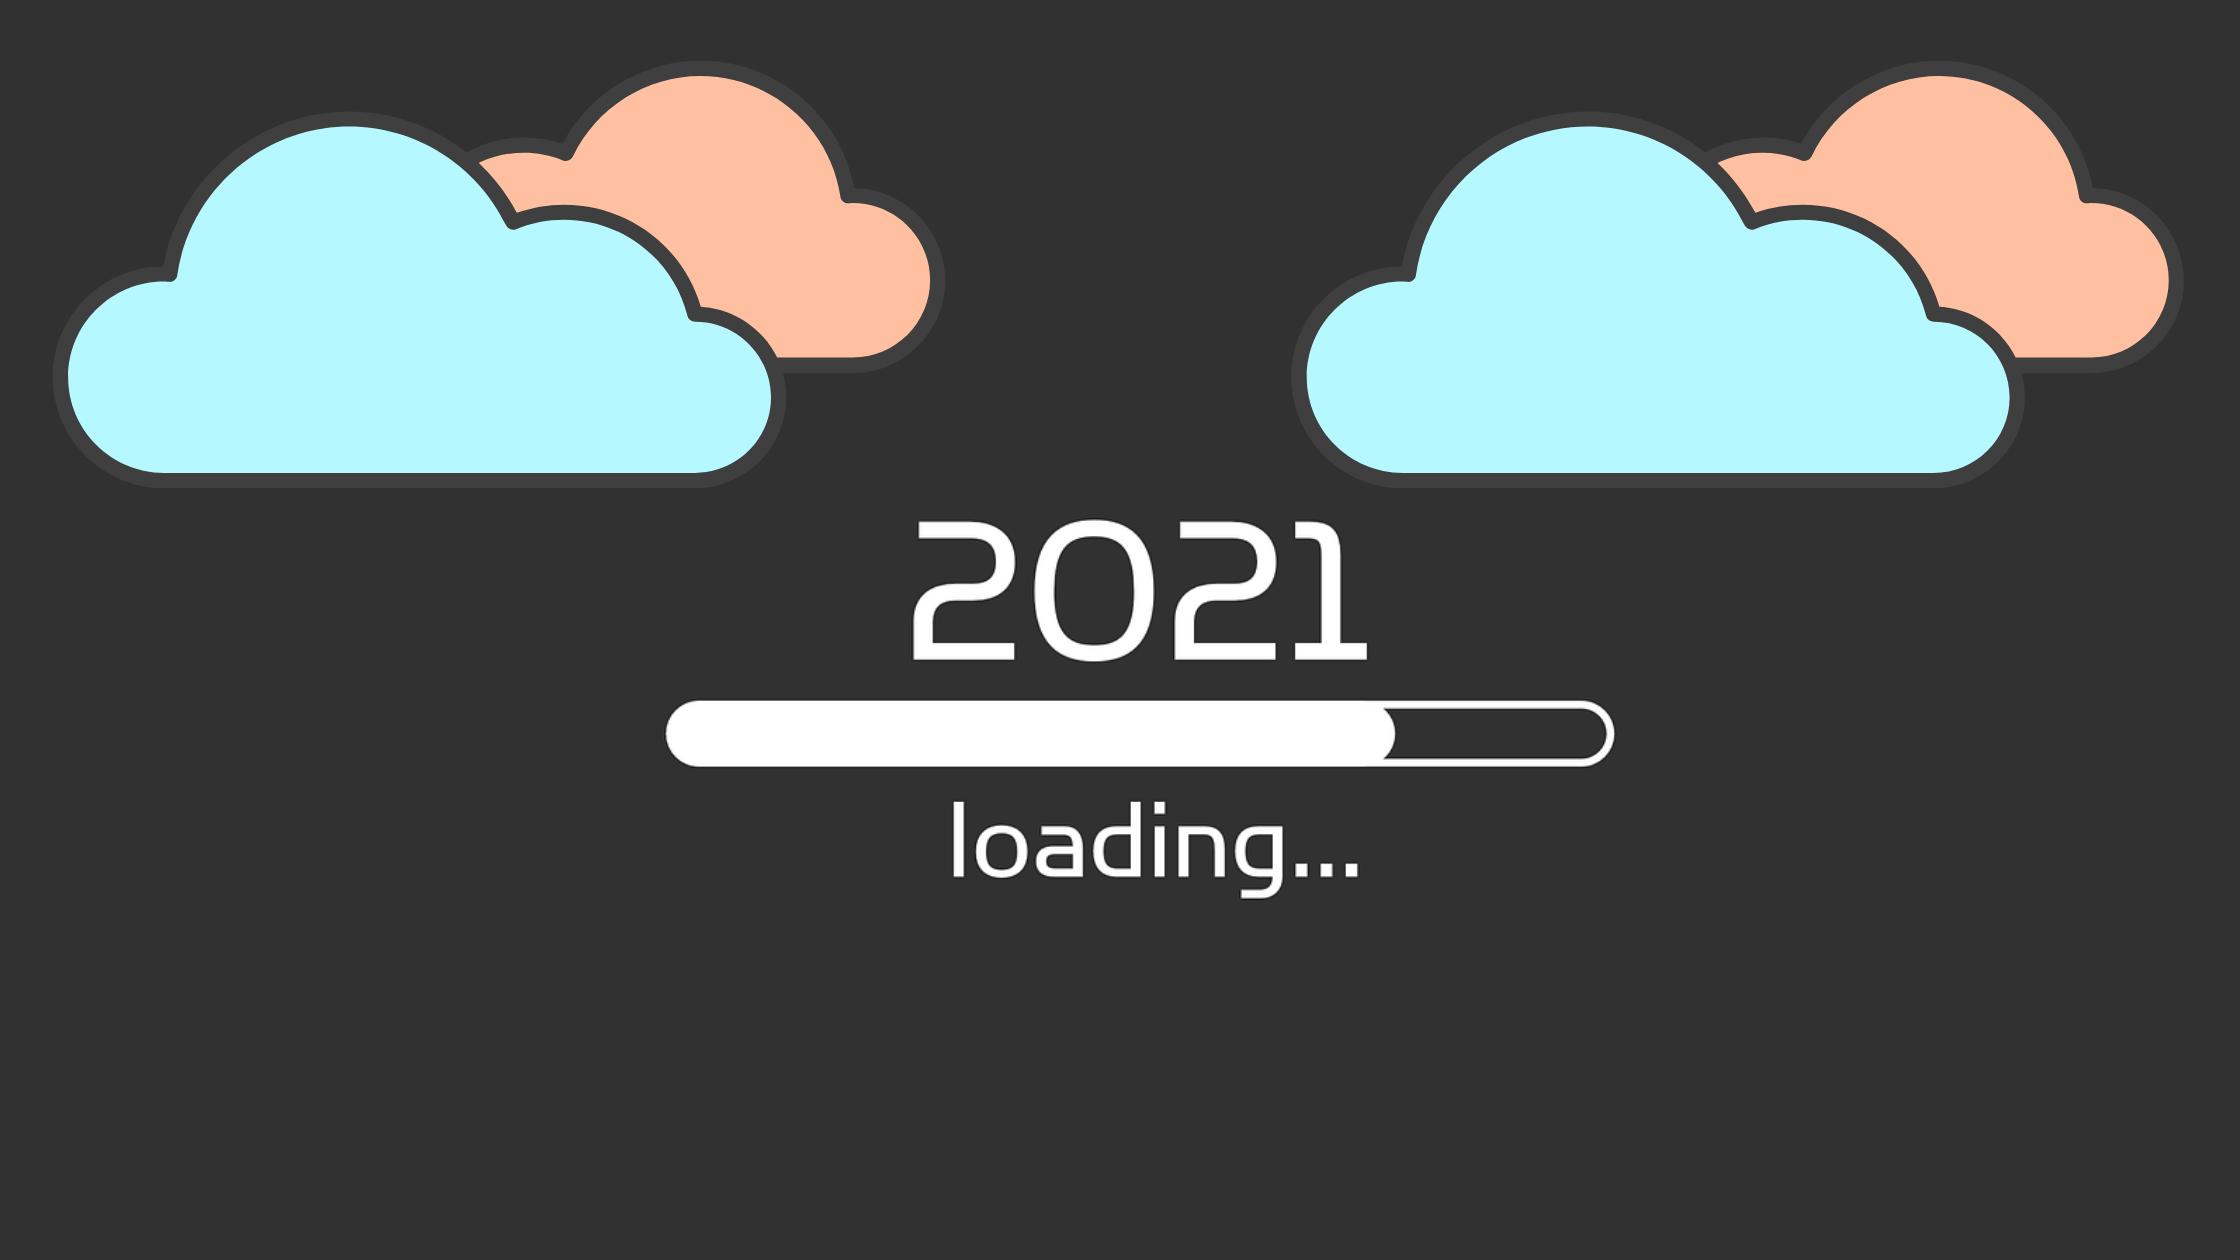 Cloud management BIG transformation in 2021